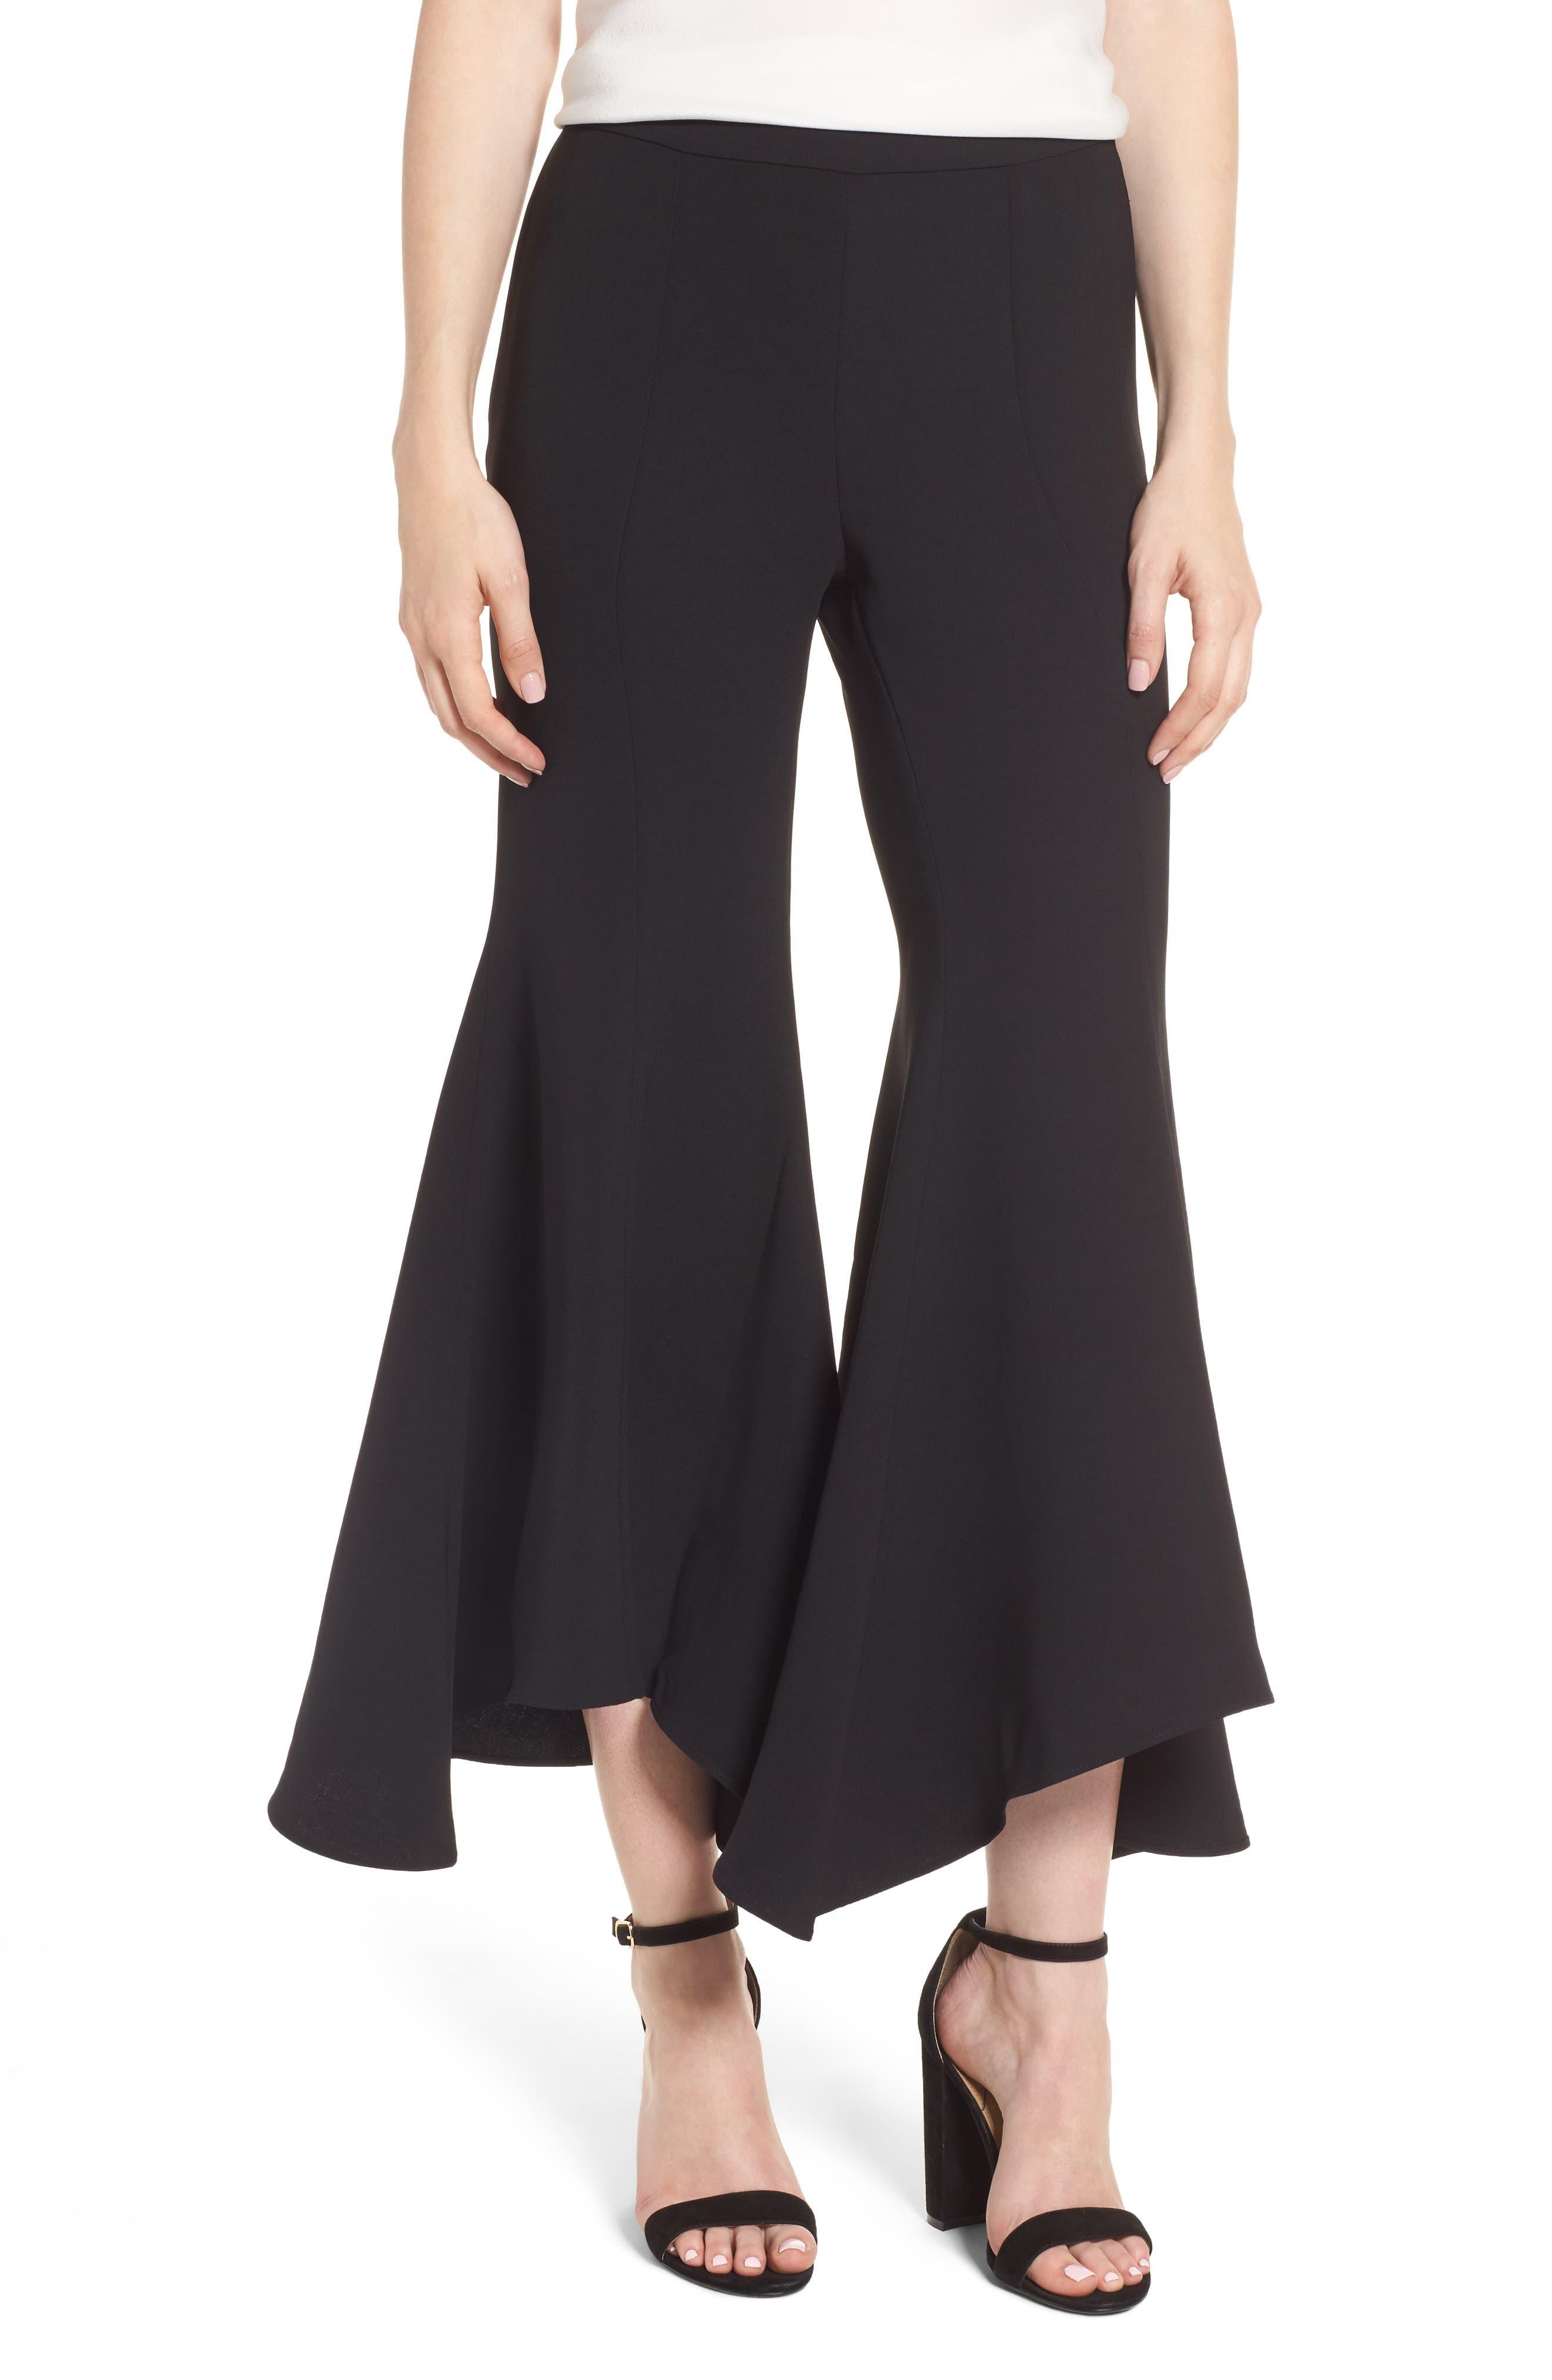 Alternate Image 1 Selected - Chelsea28 Ruffle Crop Flare Pants